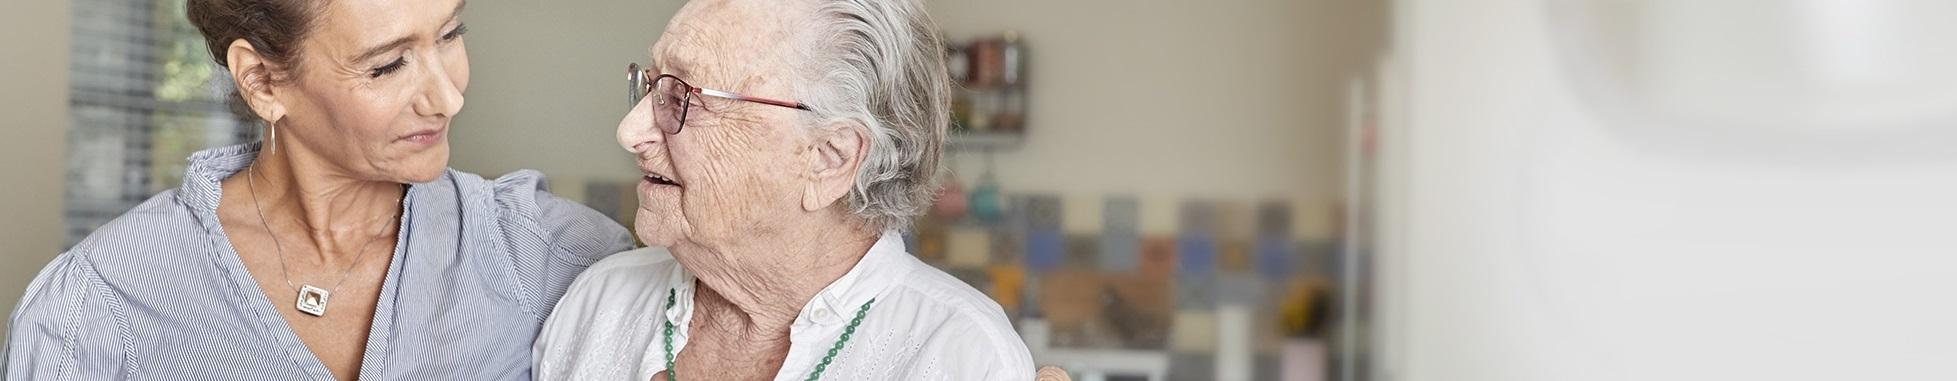 Home hospice and palliative care